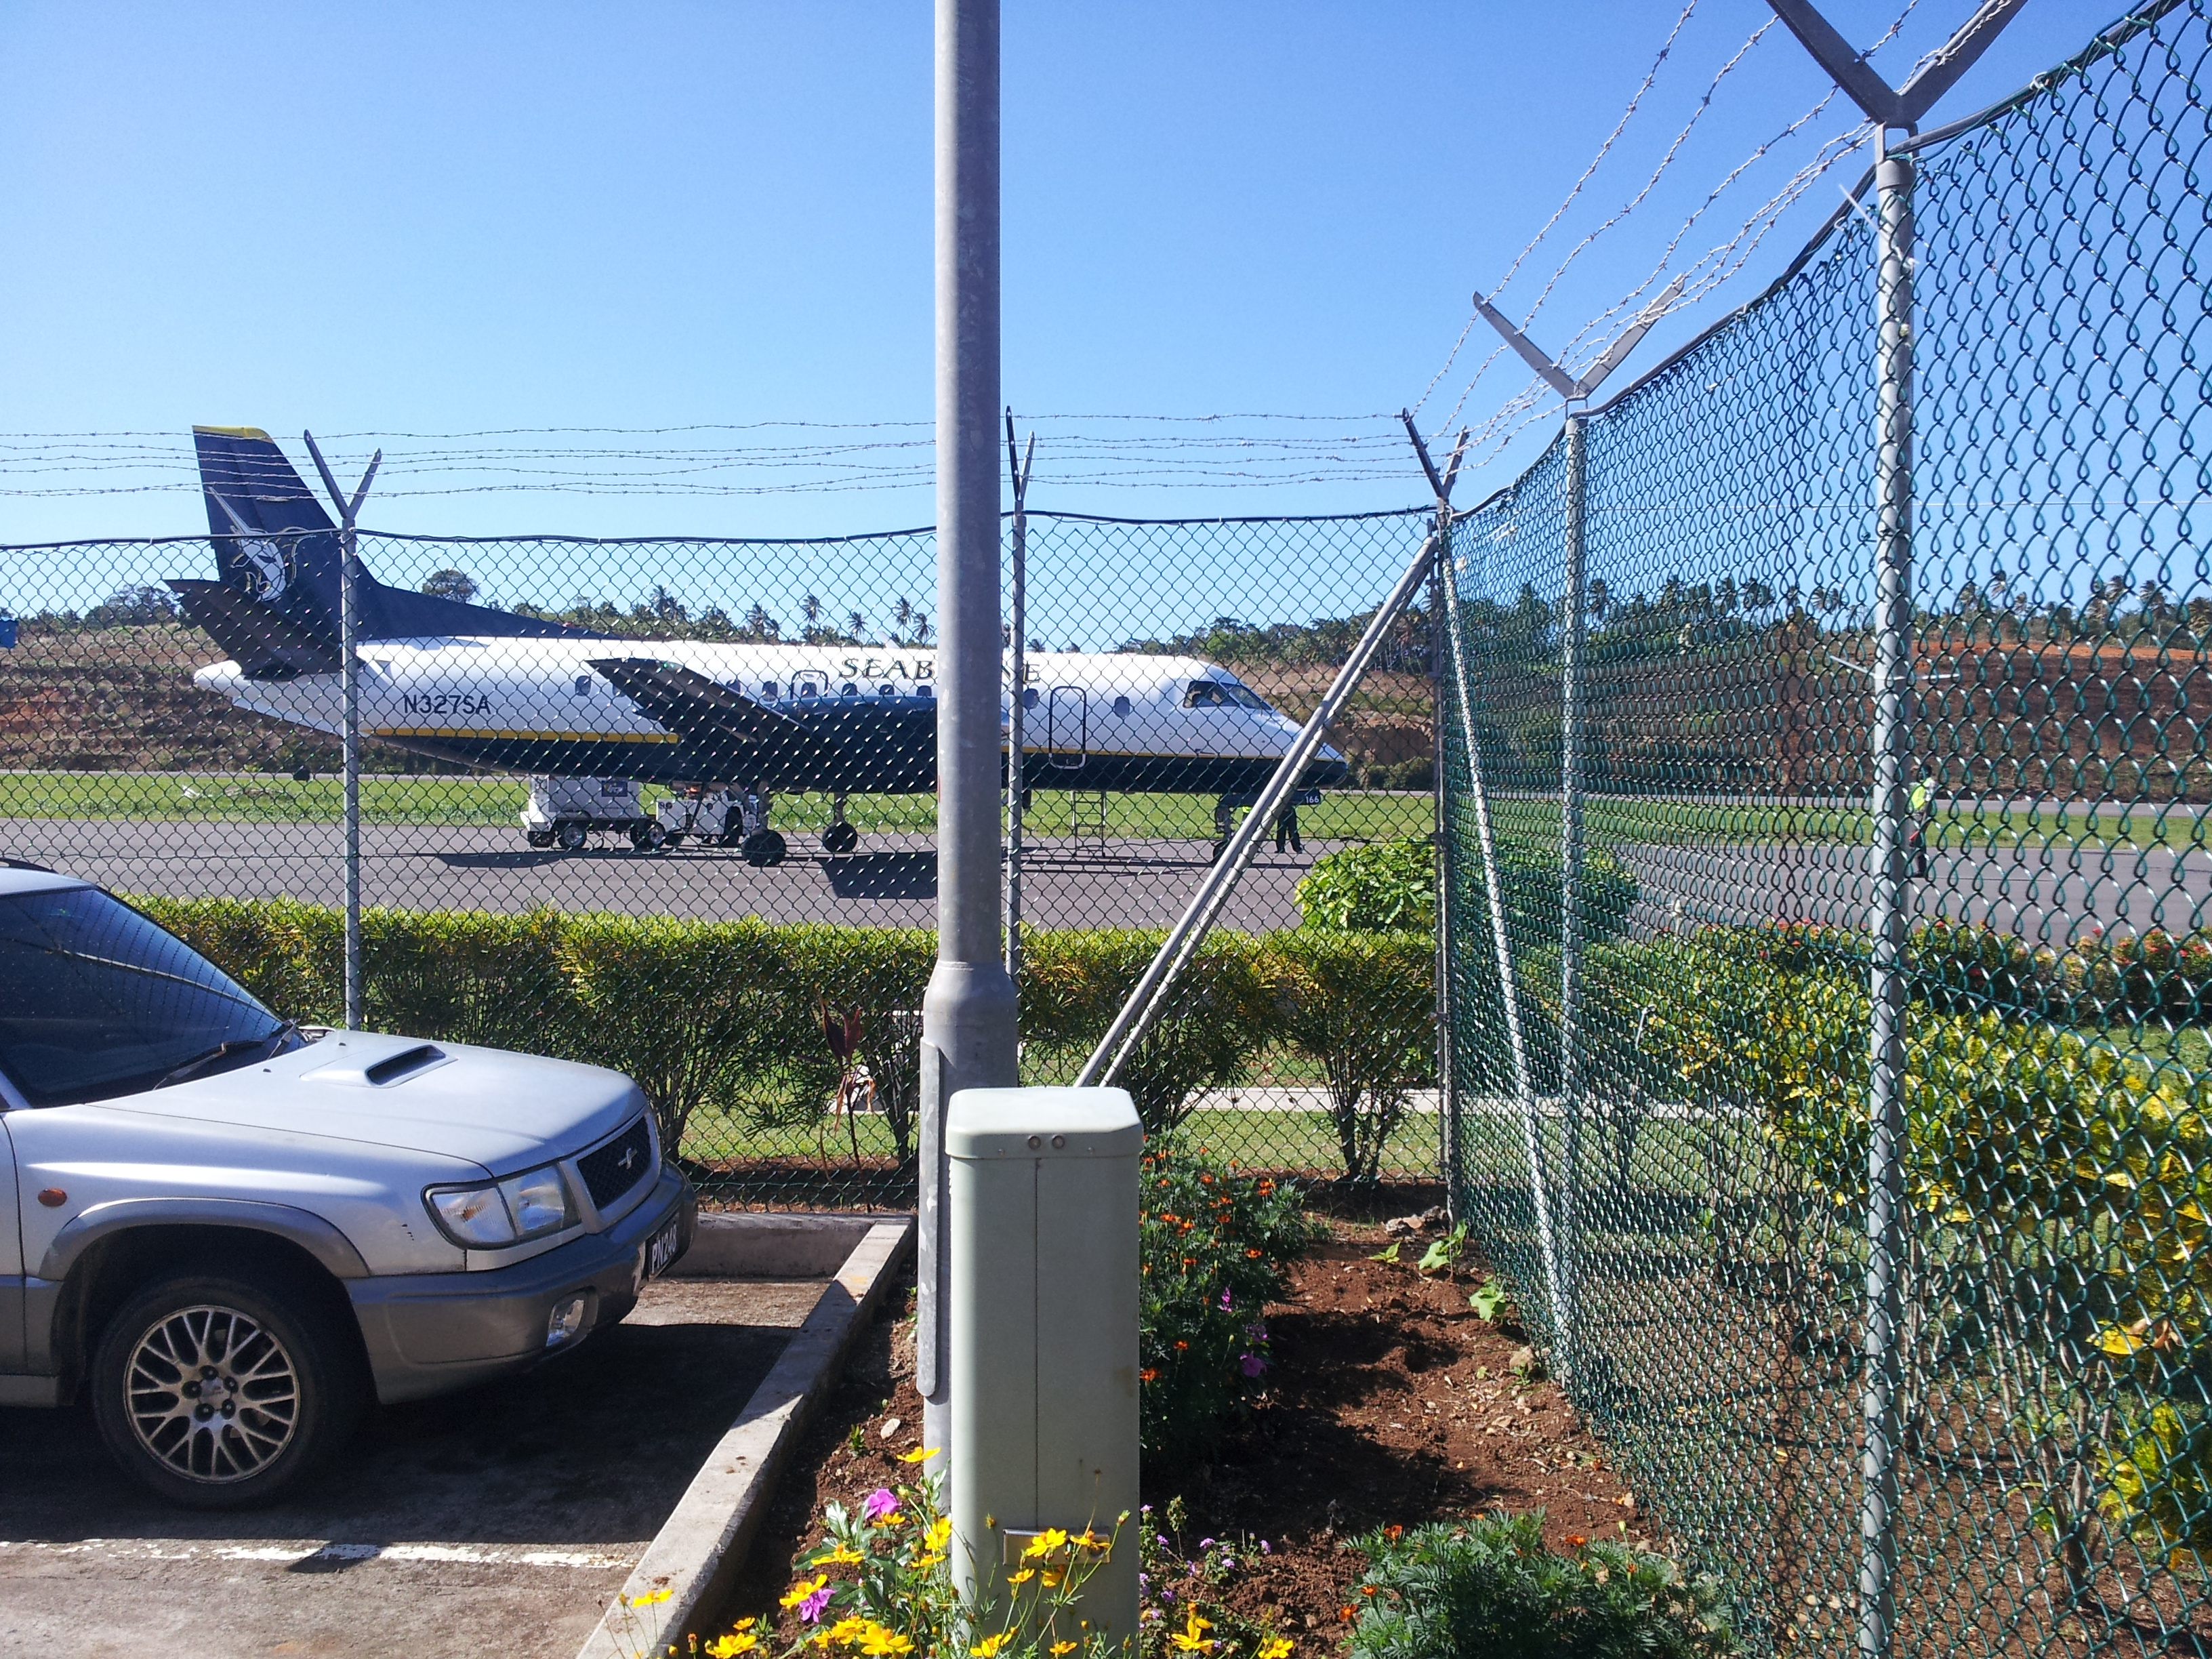 Douglas–Charles Airport